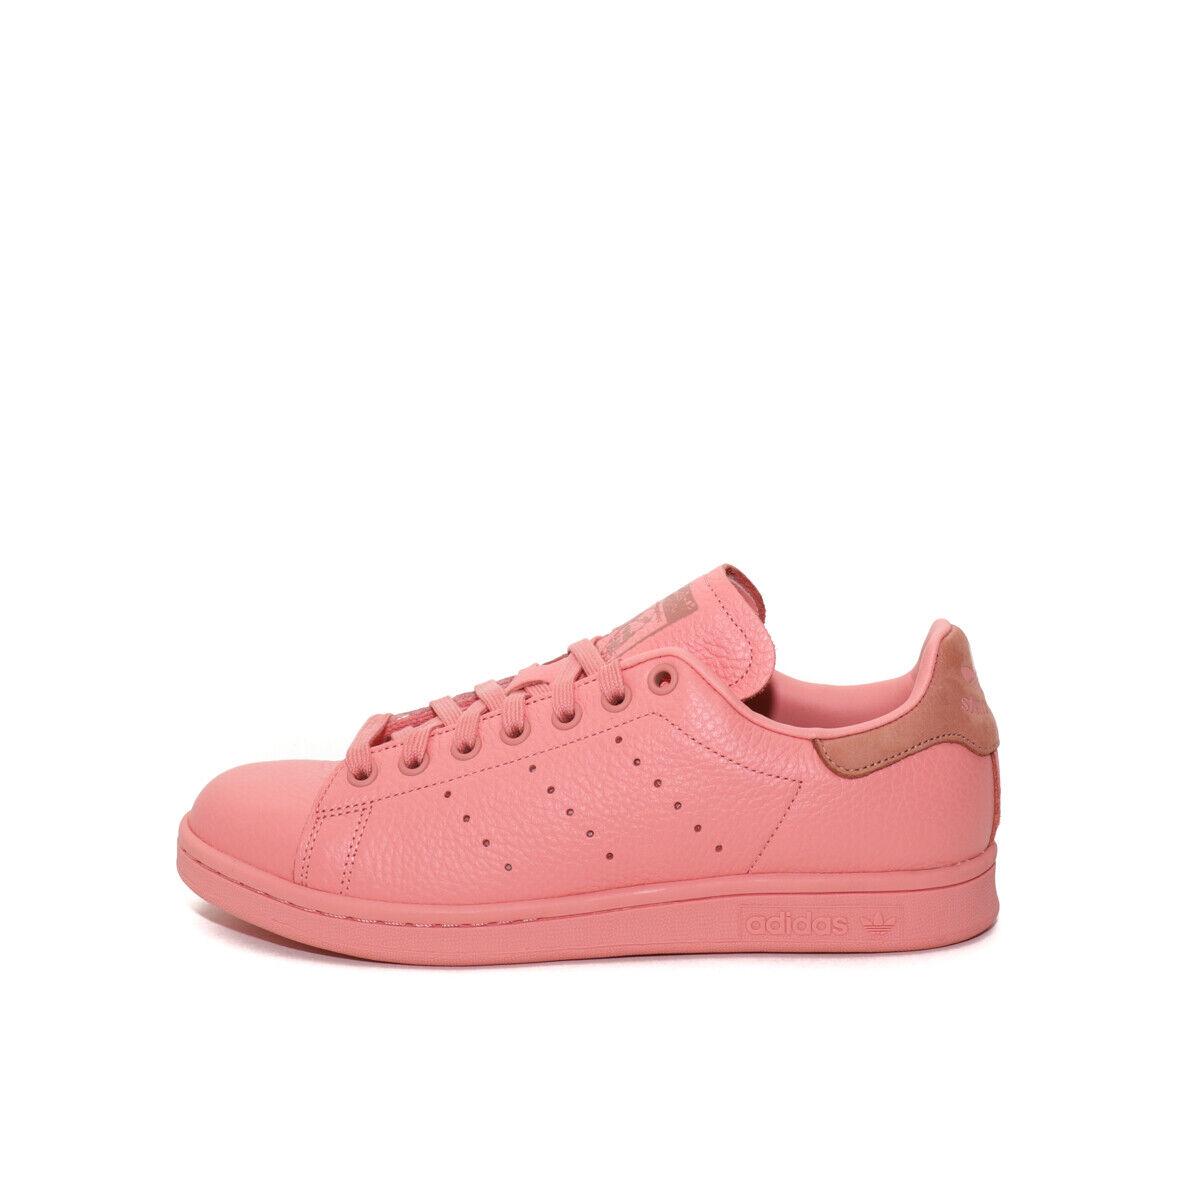 adidas originals stan smith tactile rose